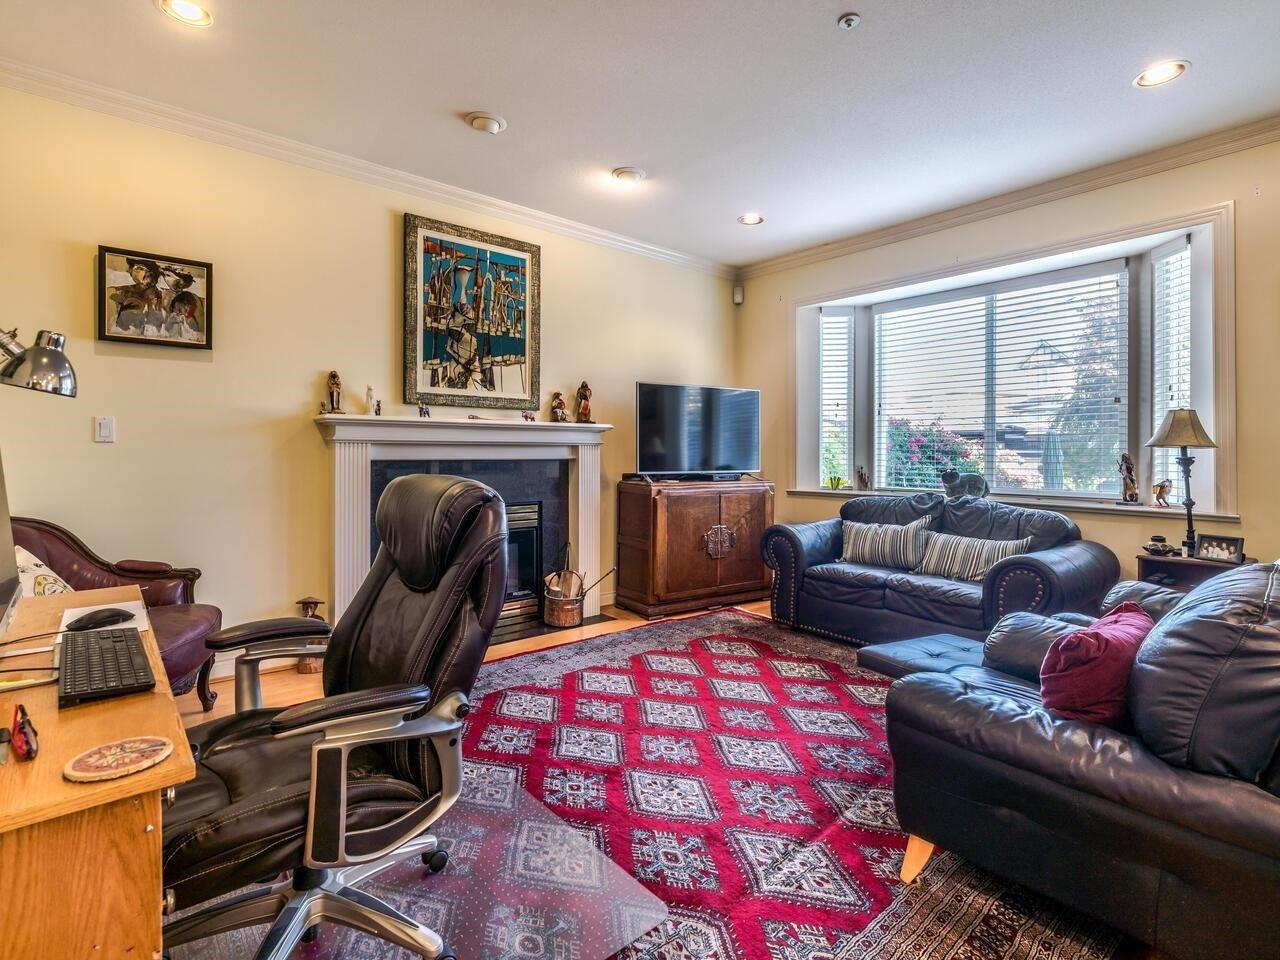 7888 JASPER CRESCENT - Fraserview VE House/Single Family for sale, 7 Bedrooms (R2622945) - #11